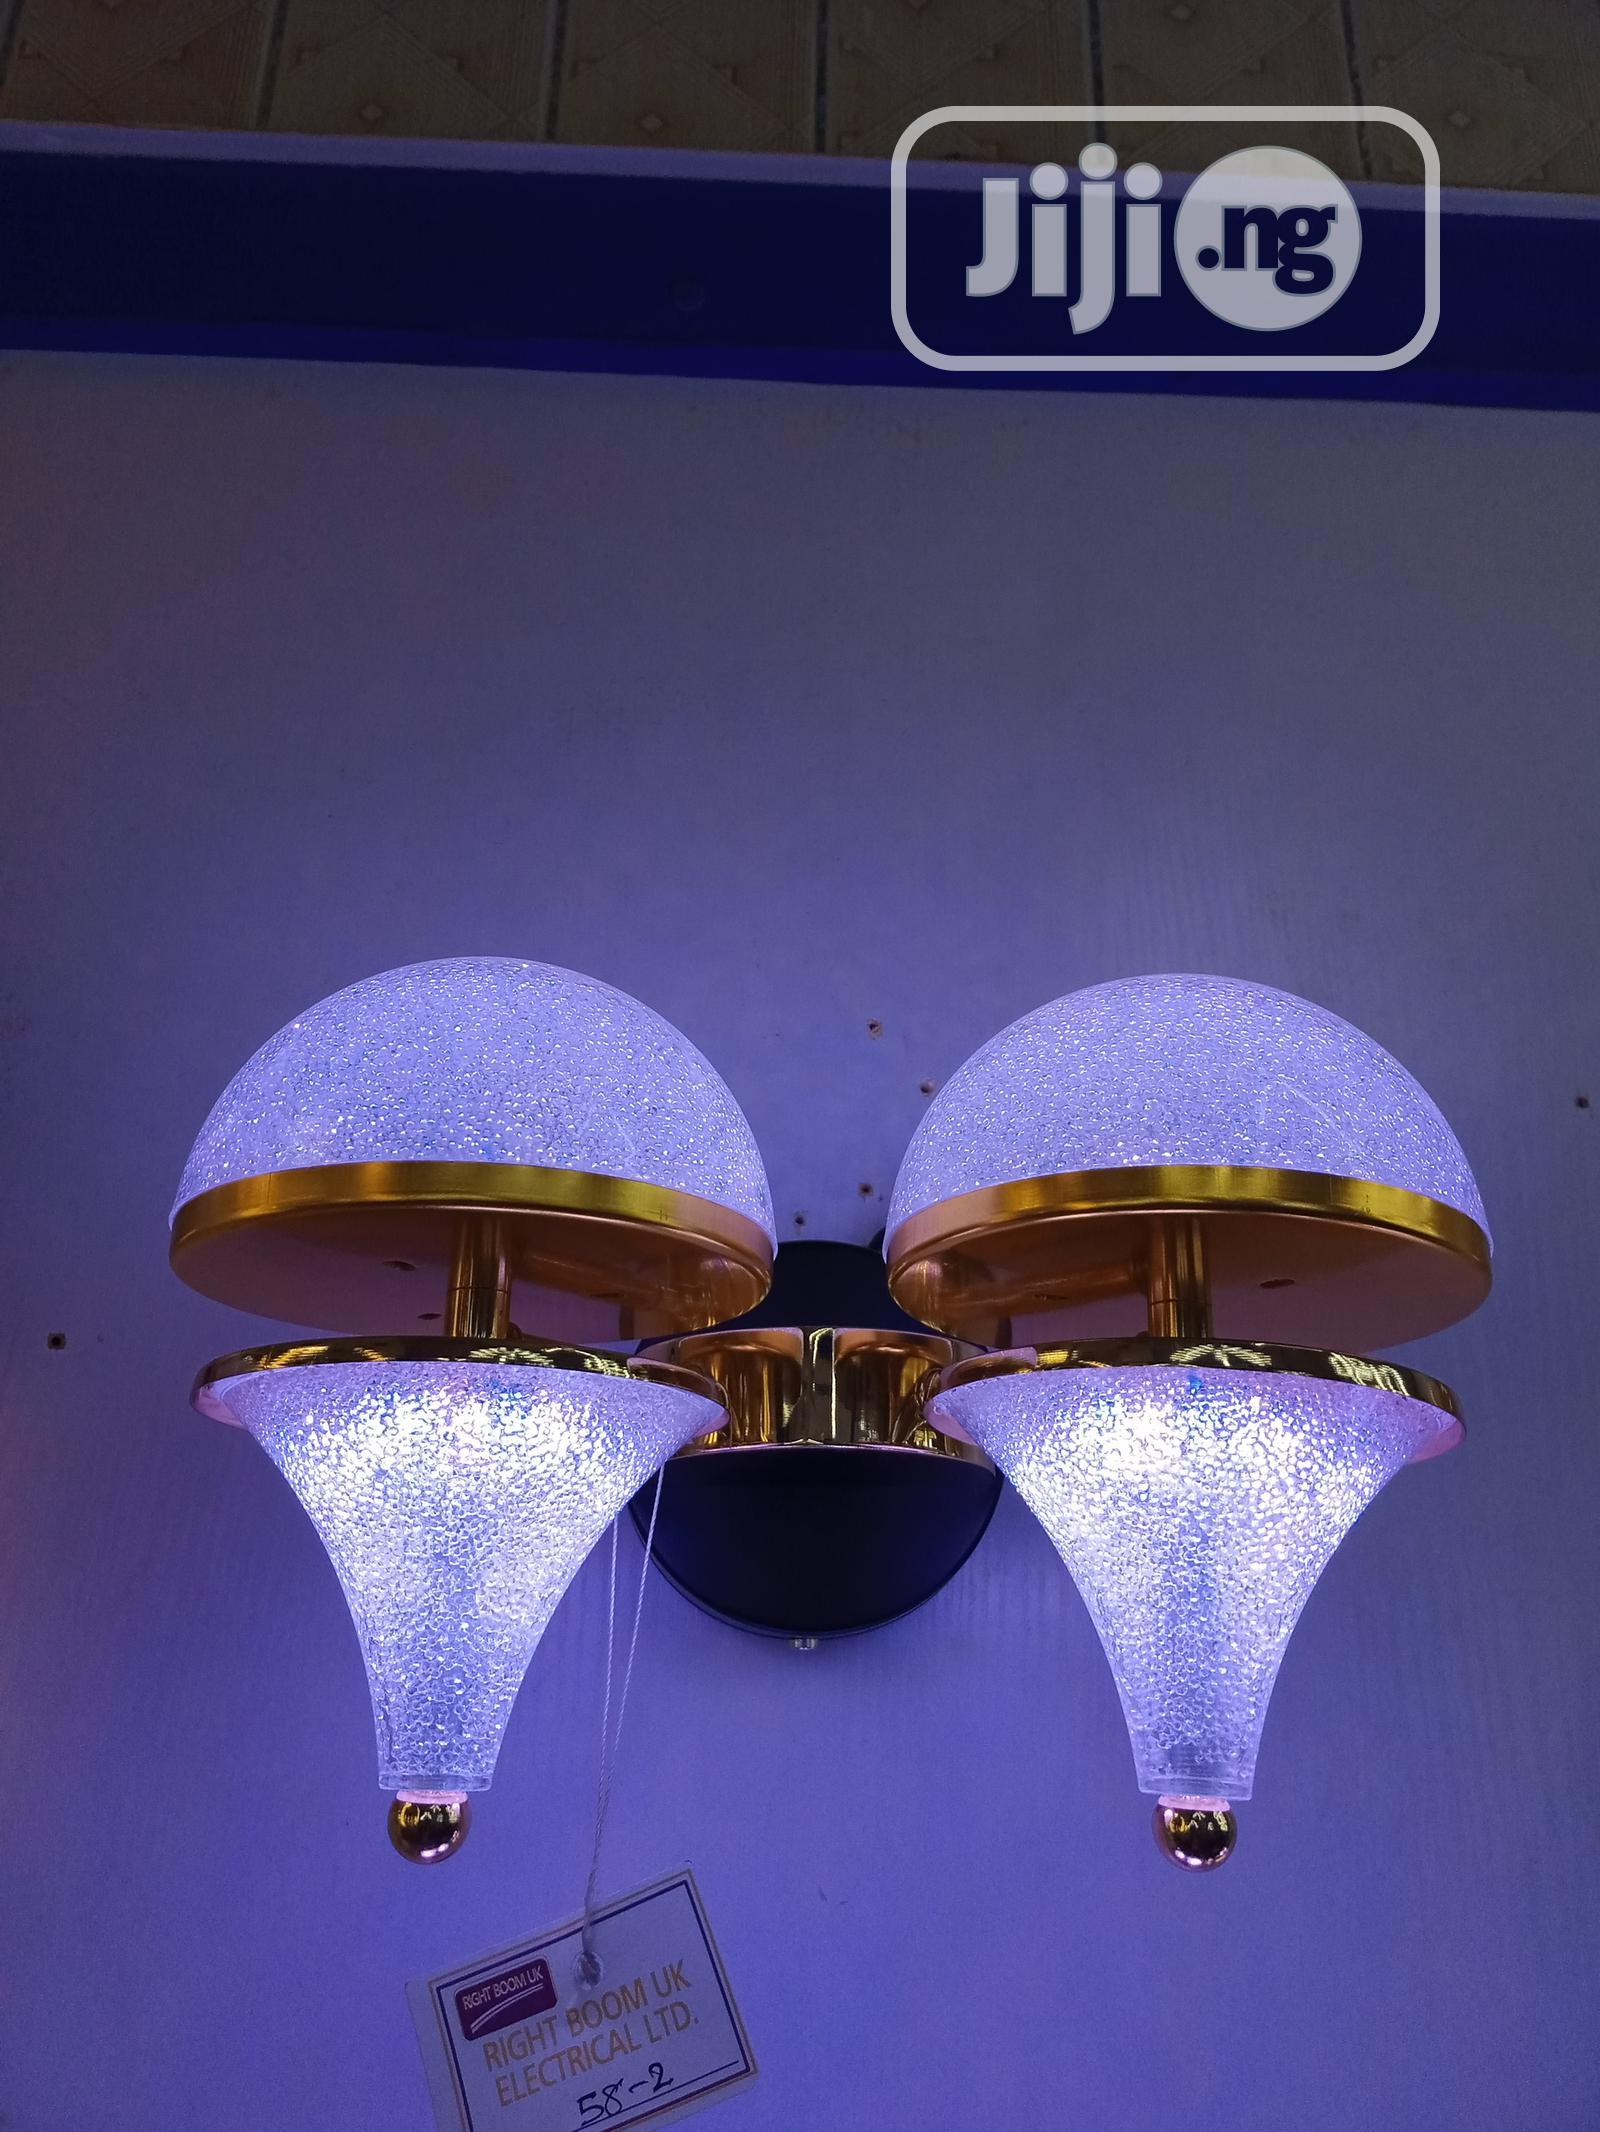 Wall Light In Alimosho Home Accessories Dan Eze Jiji Ng